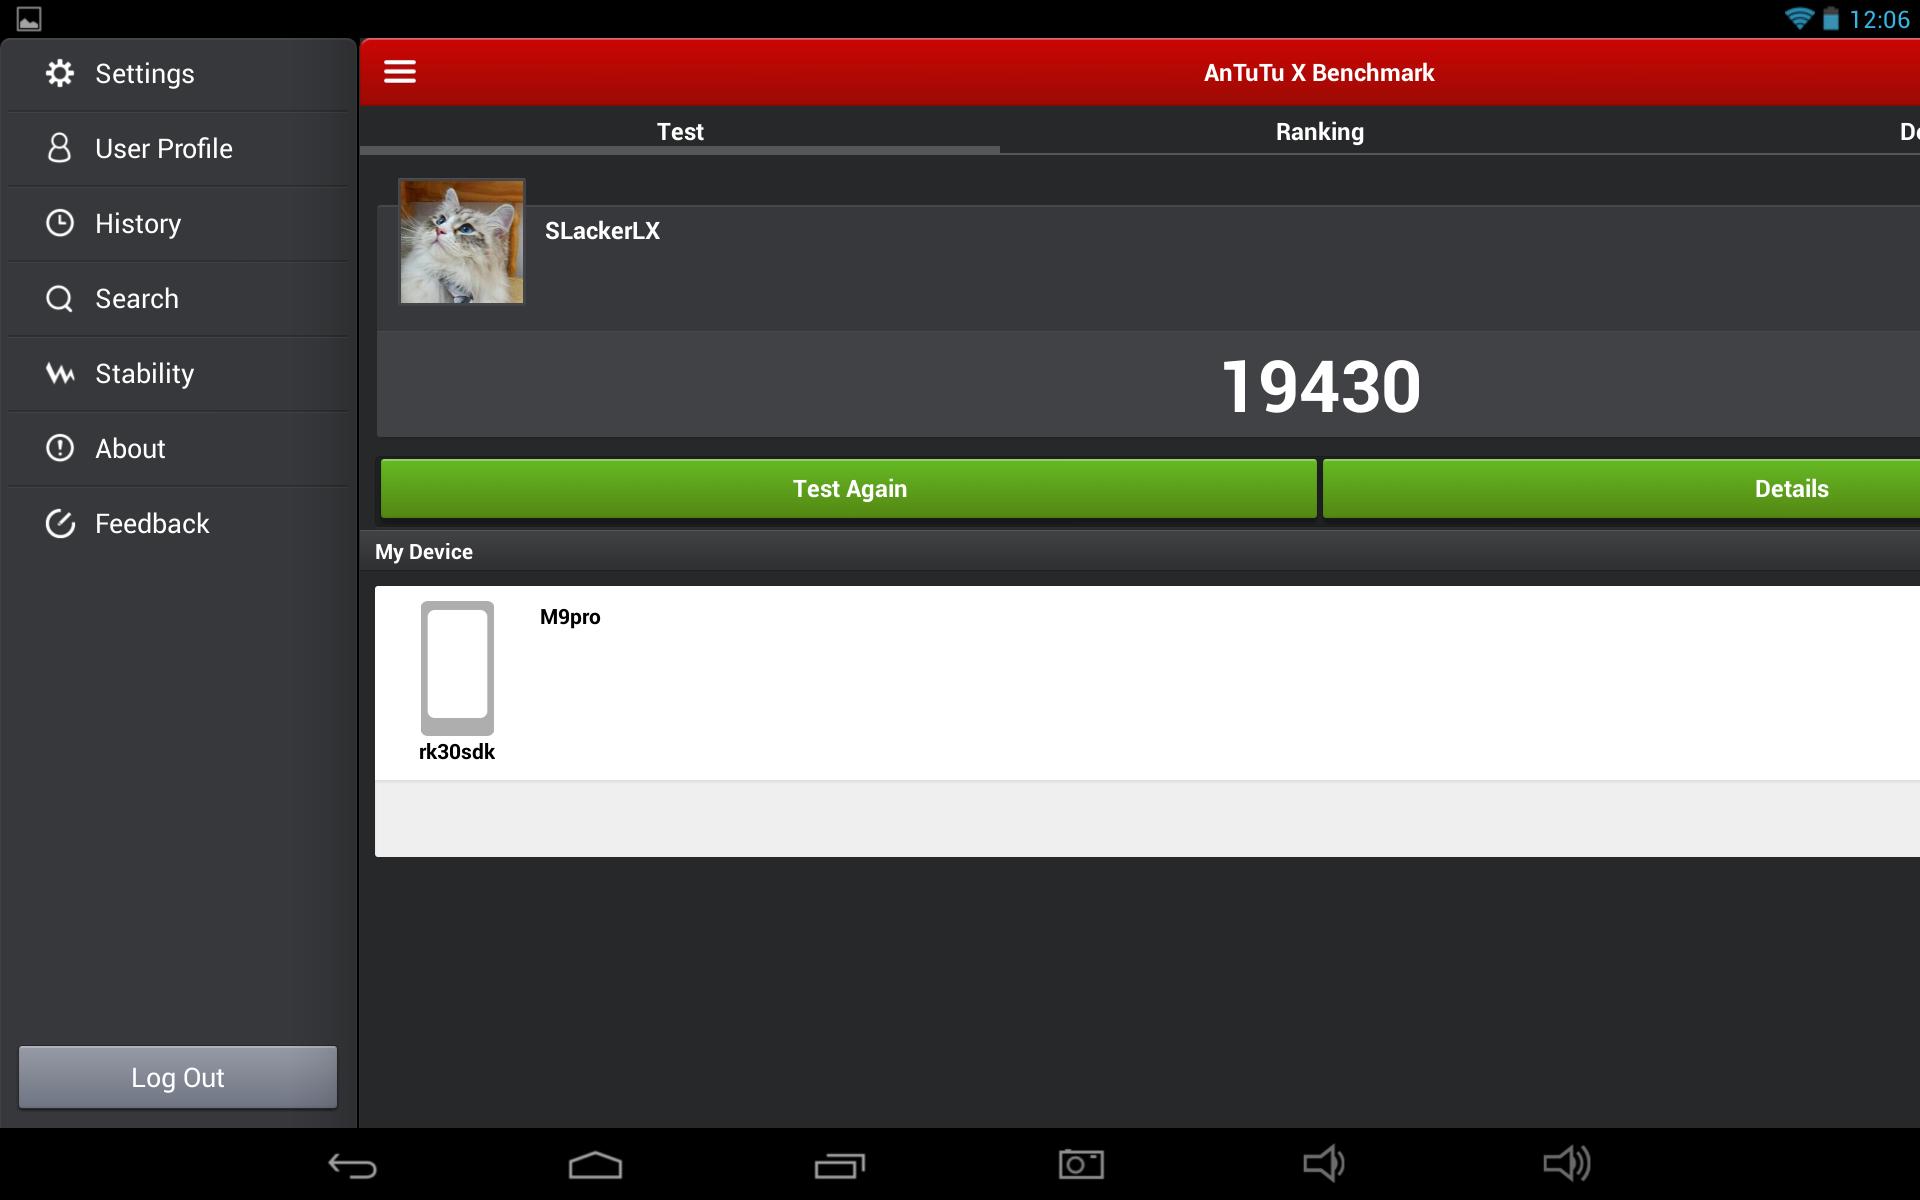 Screenshot_2013-10-25-12-06-02.png